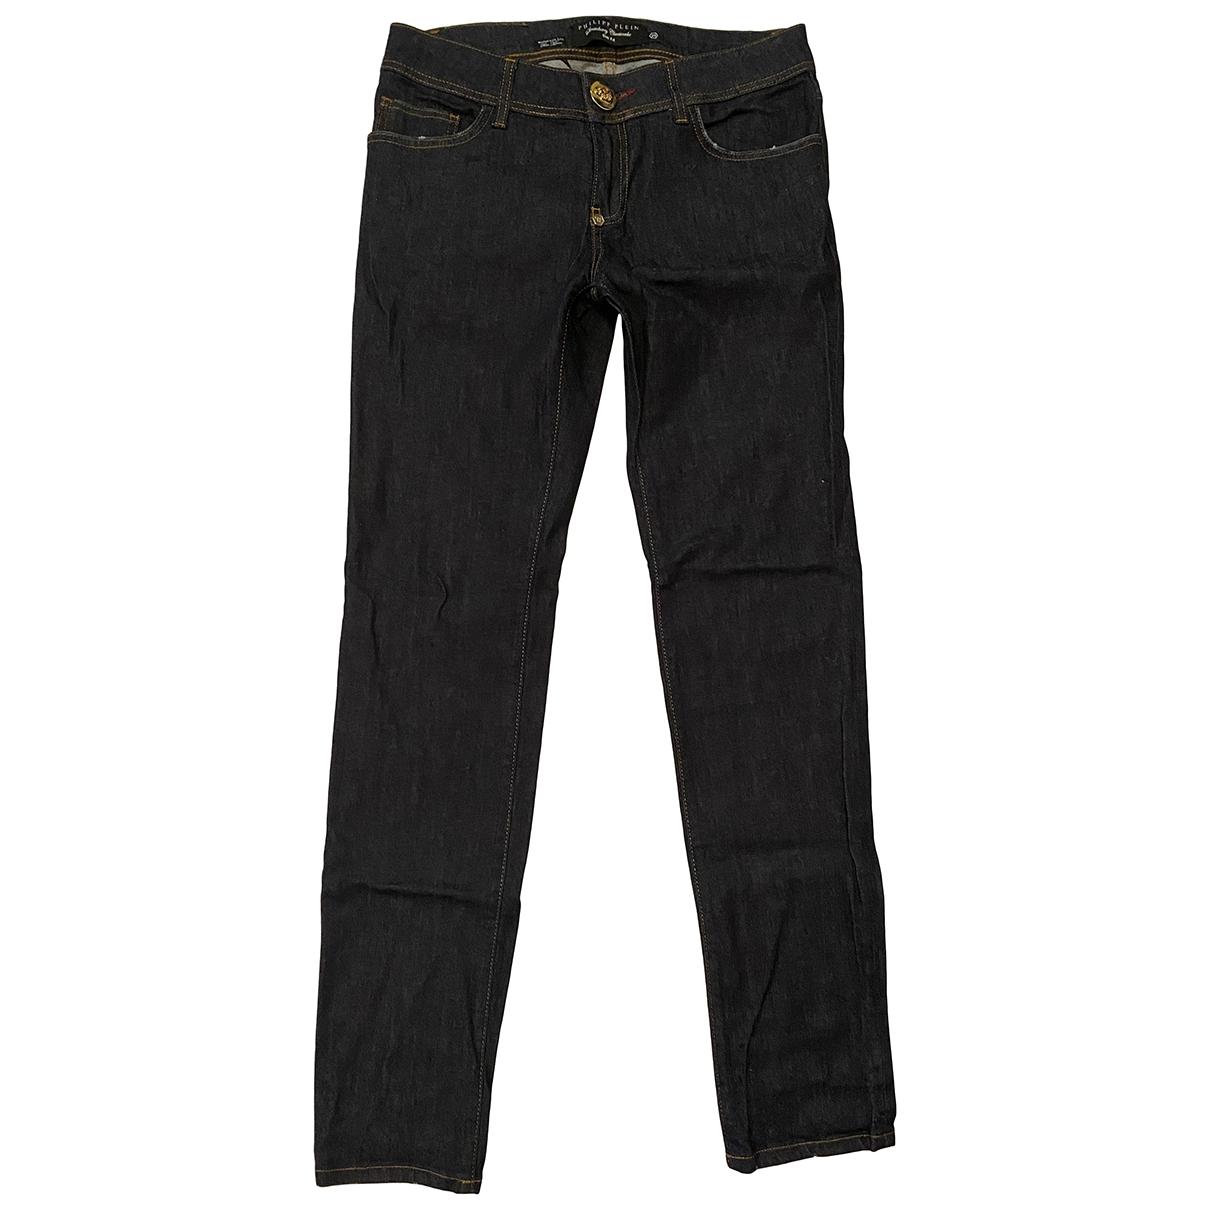 Philipp Plein \N Blue Cotton - elasthane Jeans for Women 29 US